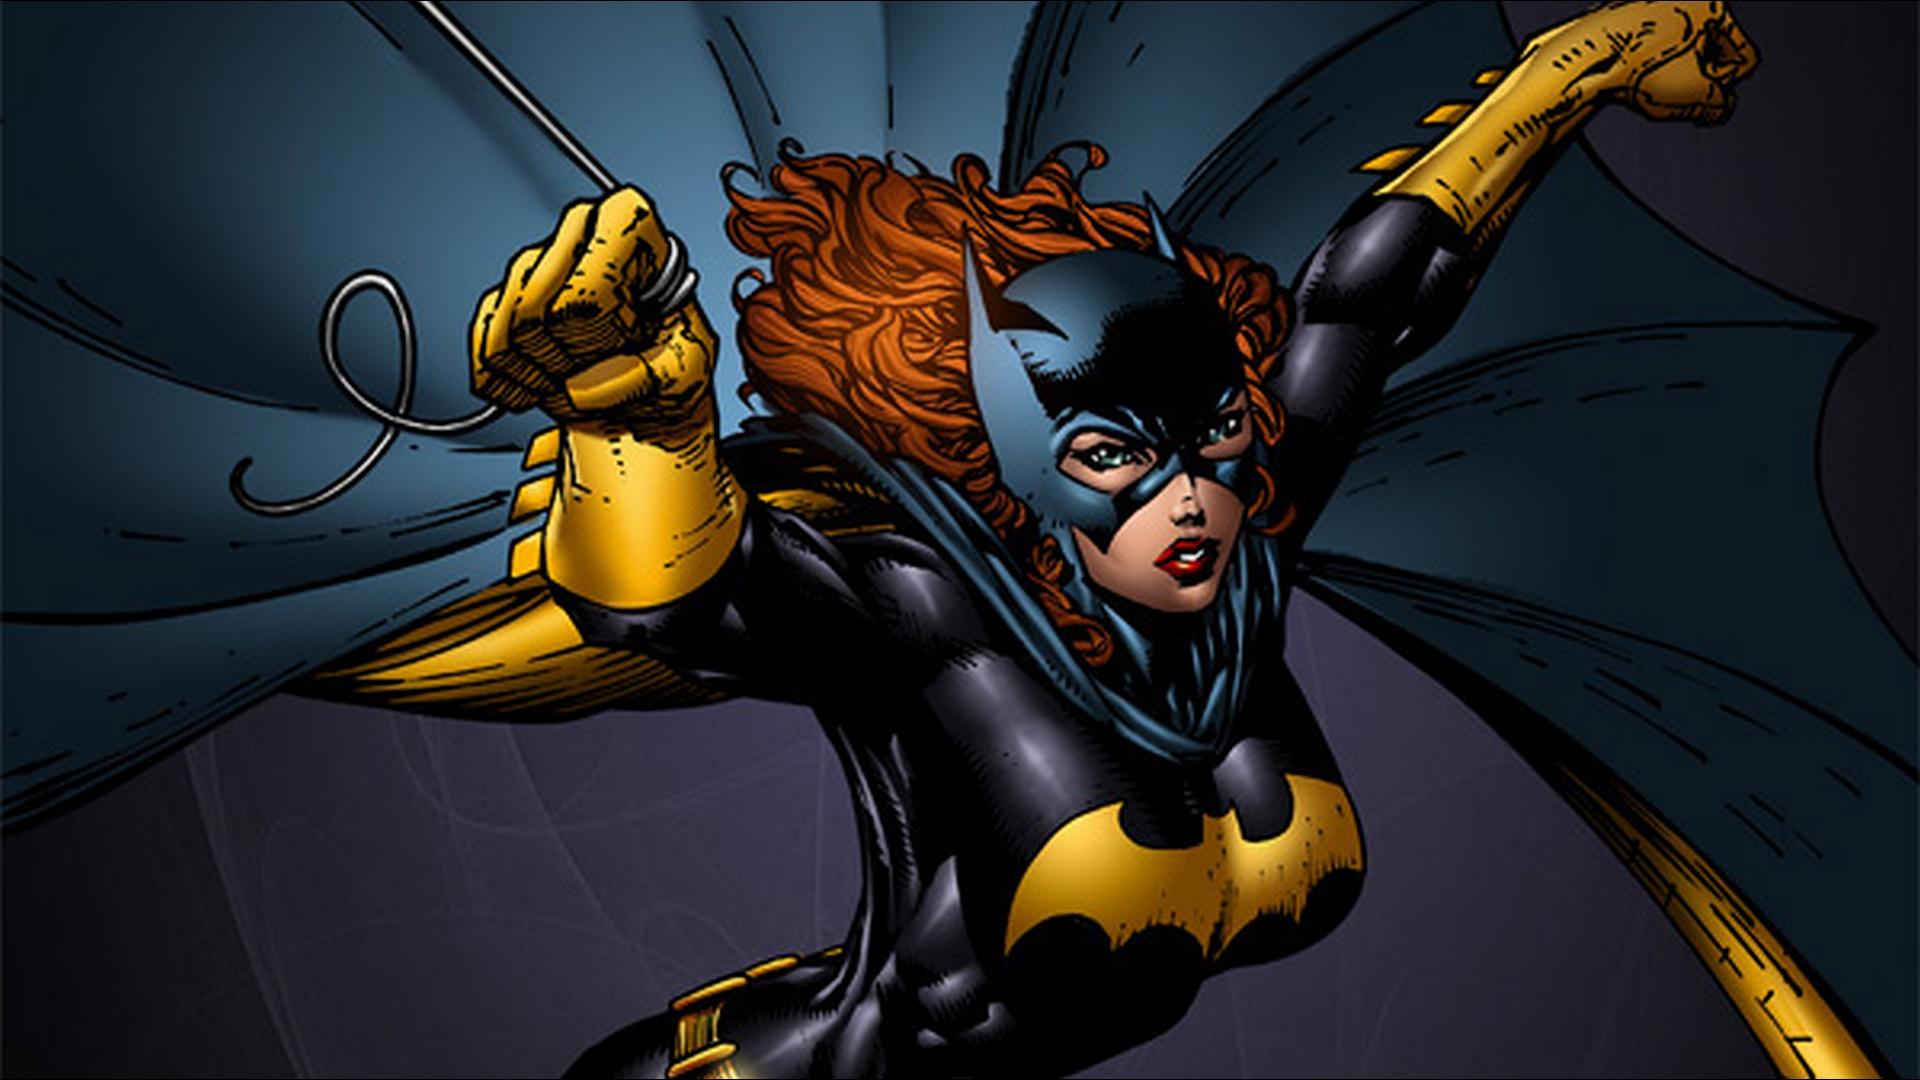 batgirl new 52 wallpaper - photo #35